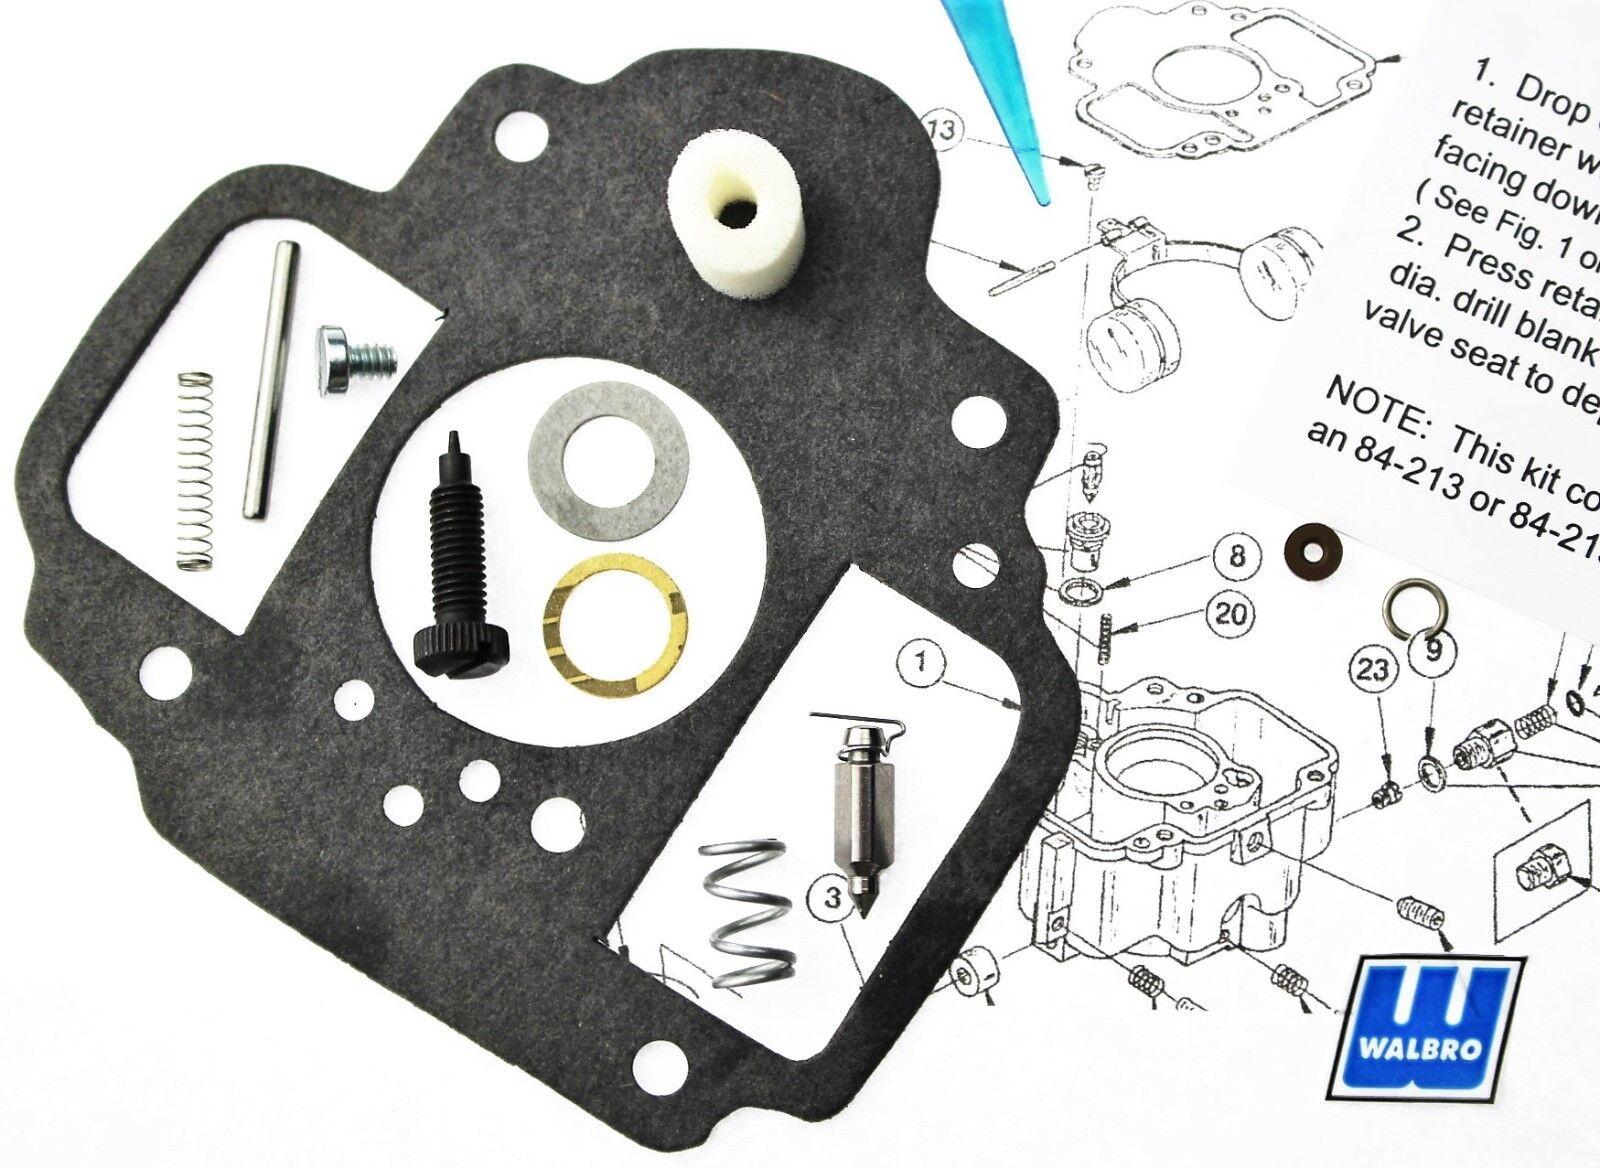 Carburetor Kit Diagram Lua7 Fits Onan 146 0230d 65 Nh 40 Bfa 50 Enginebriggs And Parts List For Murray Walkbehindlawnmower Bga